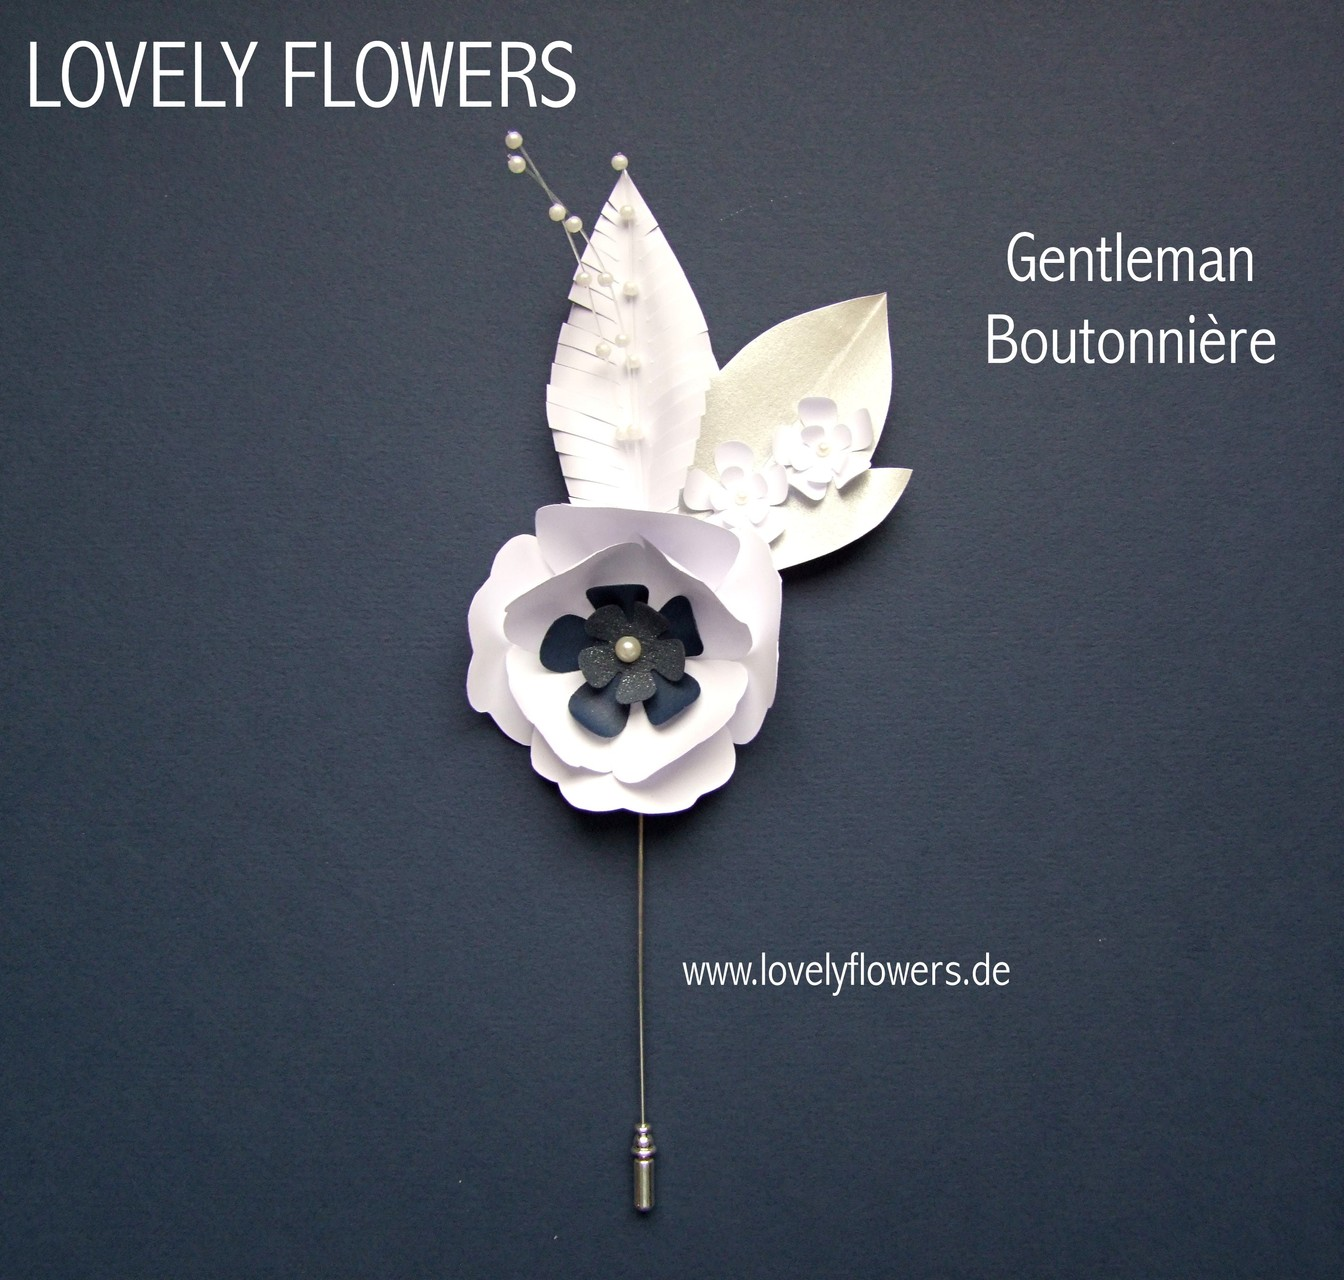 Paper-Art Bräutigam Boutonnière Anzug-/Smoking Ansteckblüte von www.lovelyflowers.de